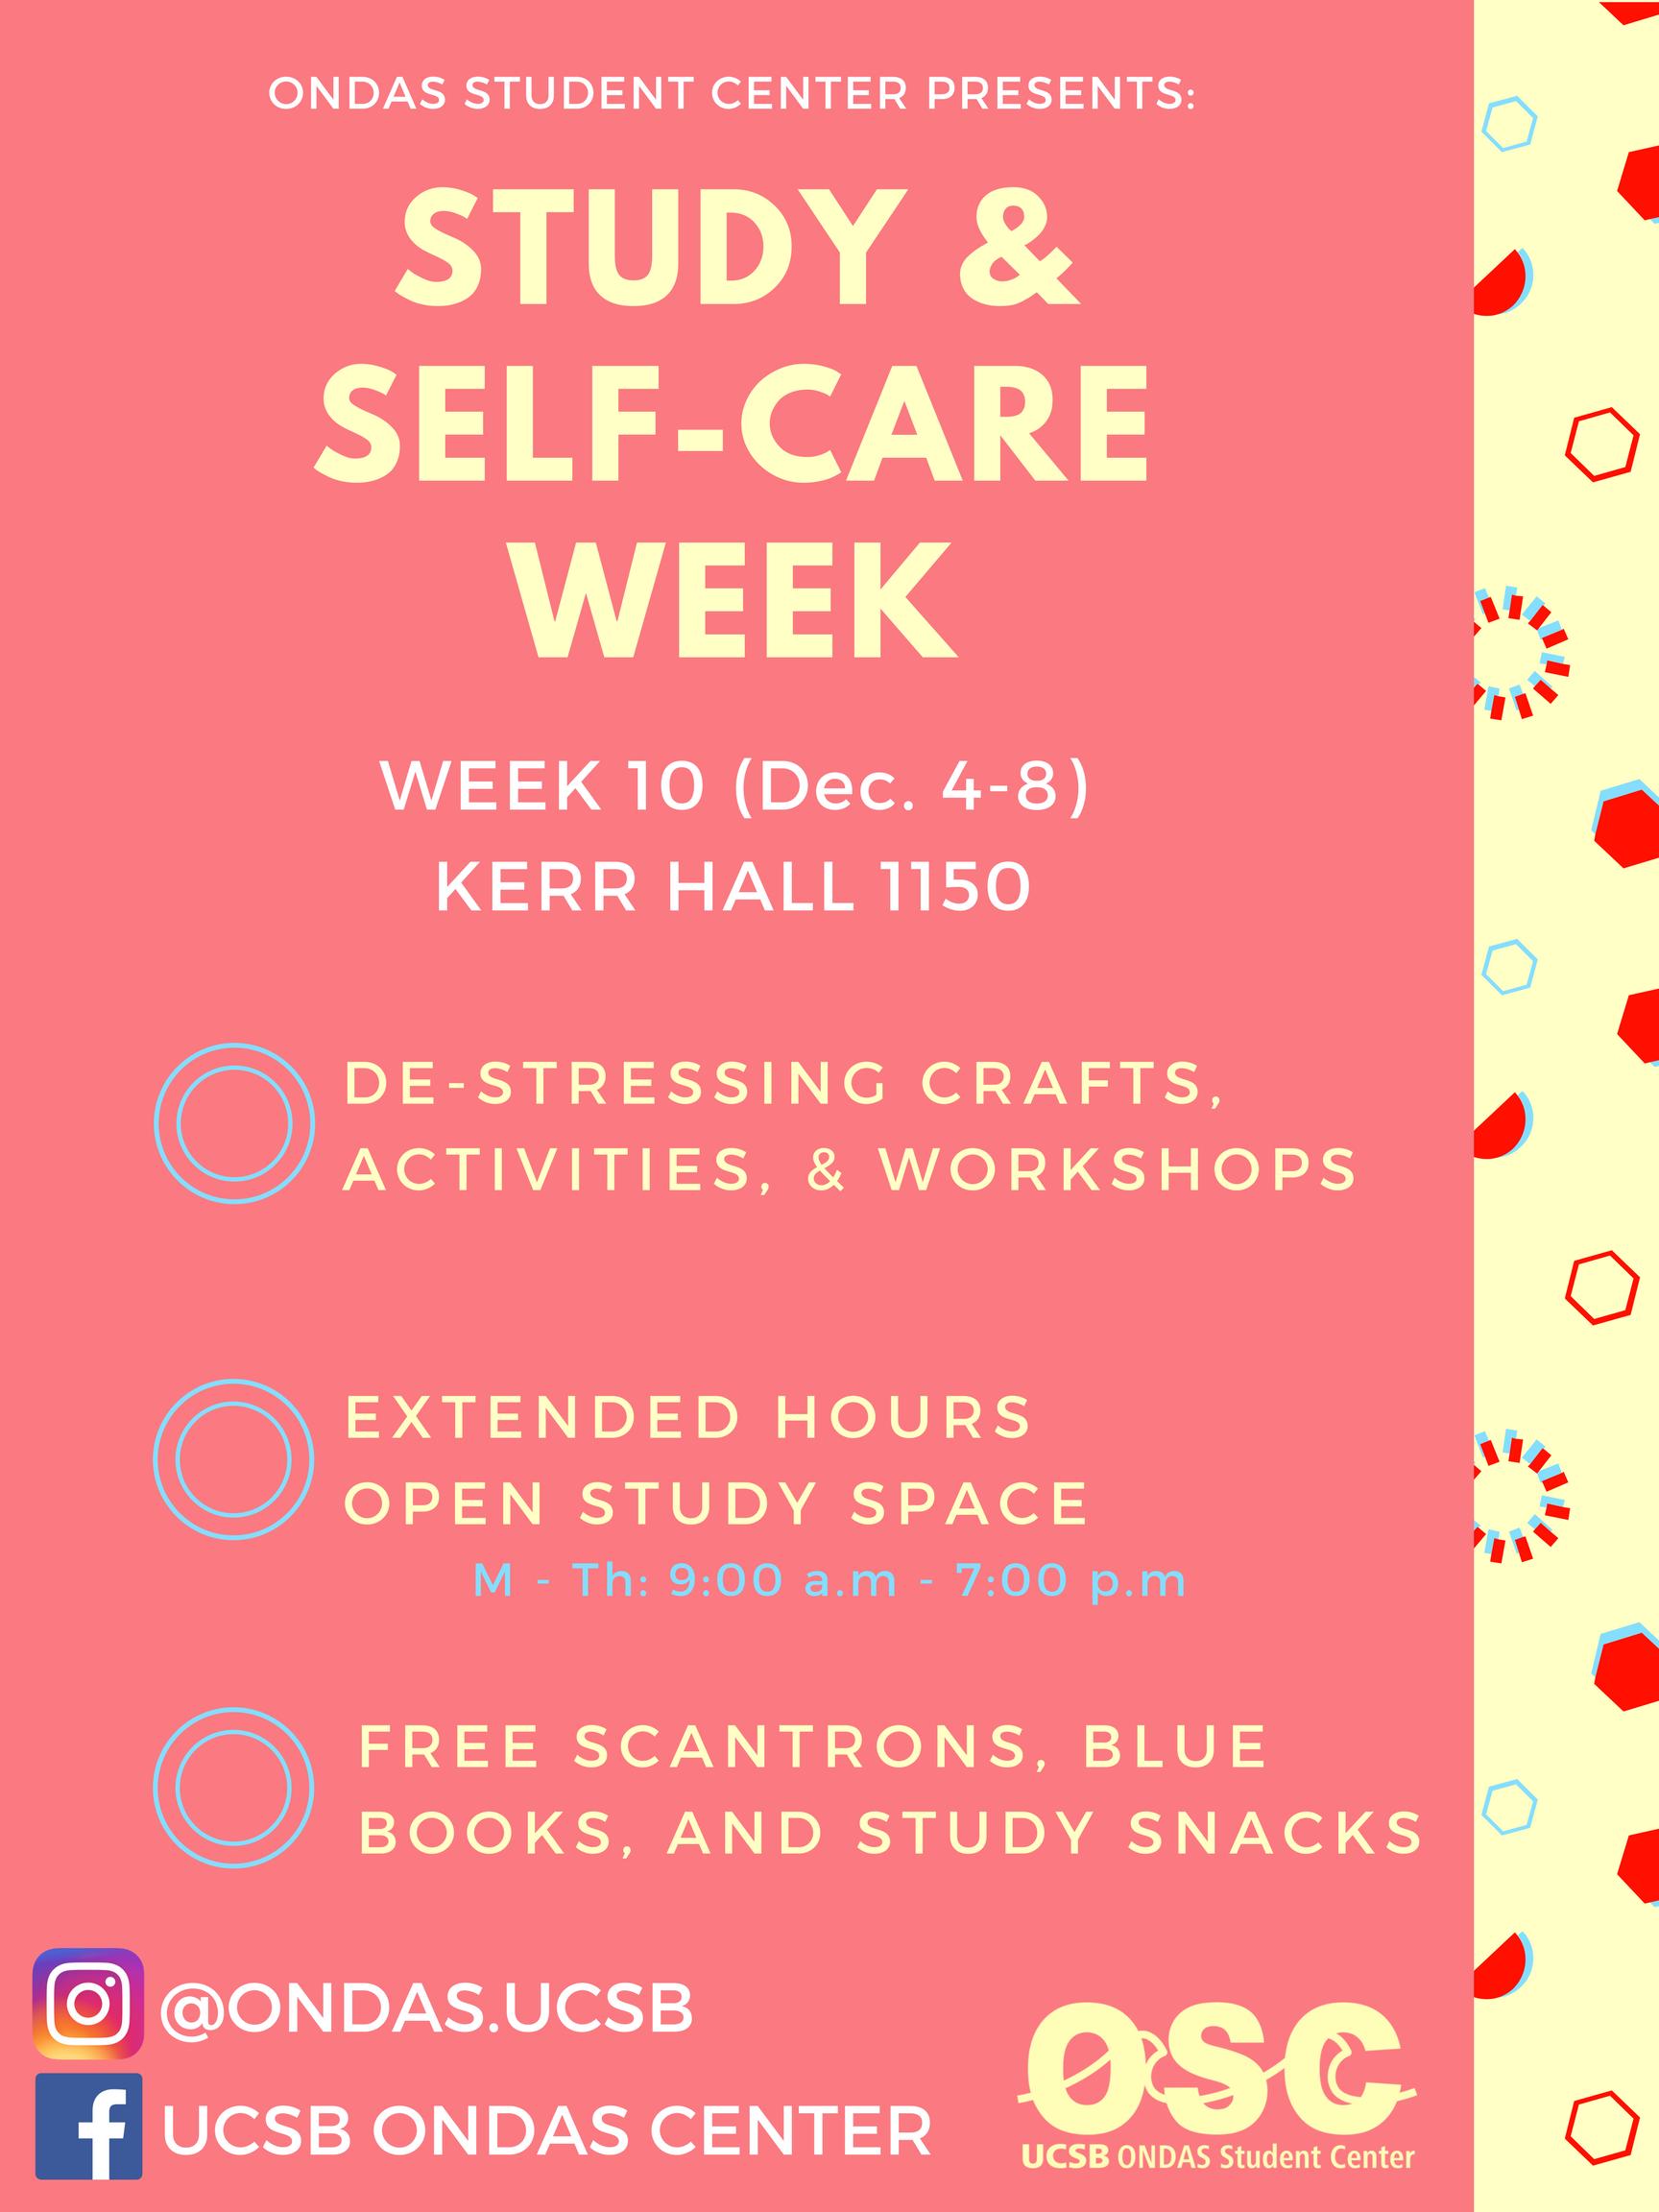 Study Self Care Week Ondas Student Center Uc Santa Barbara